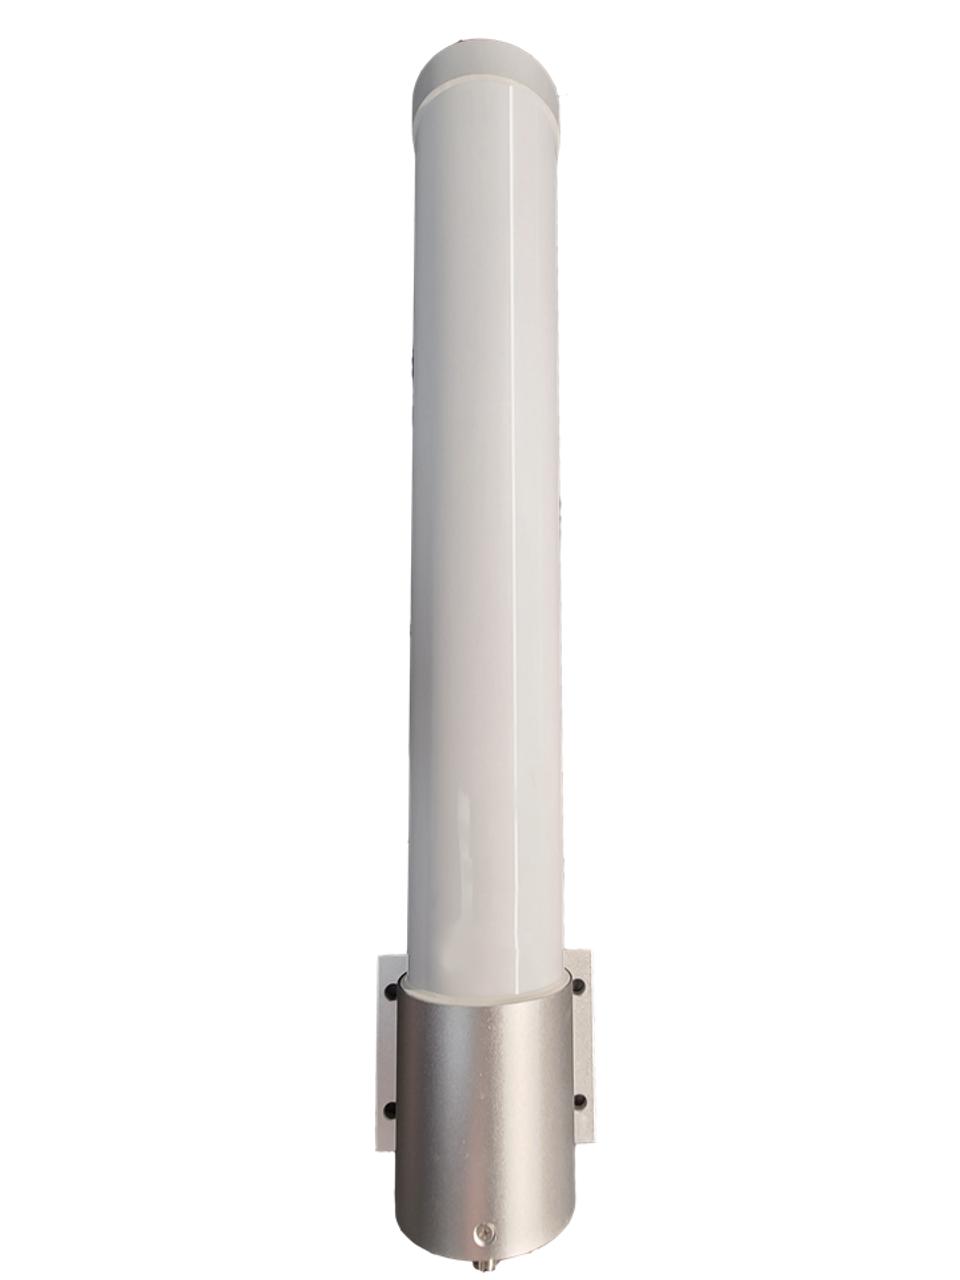 M25 Omni Directional Cellular 4G LTE CBRS 5G Antenna w/ Bracket Mount - N Female